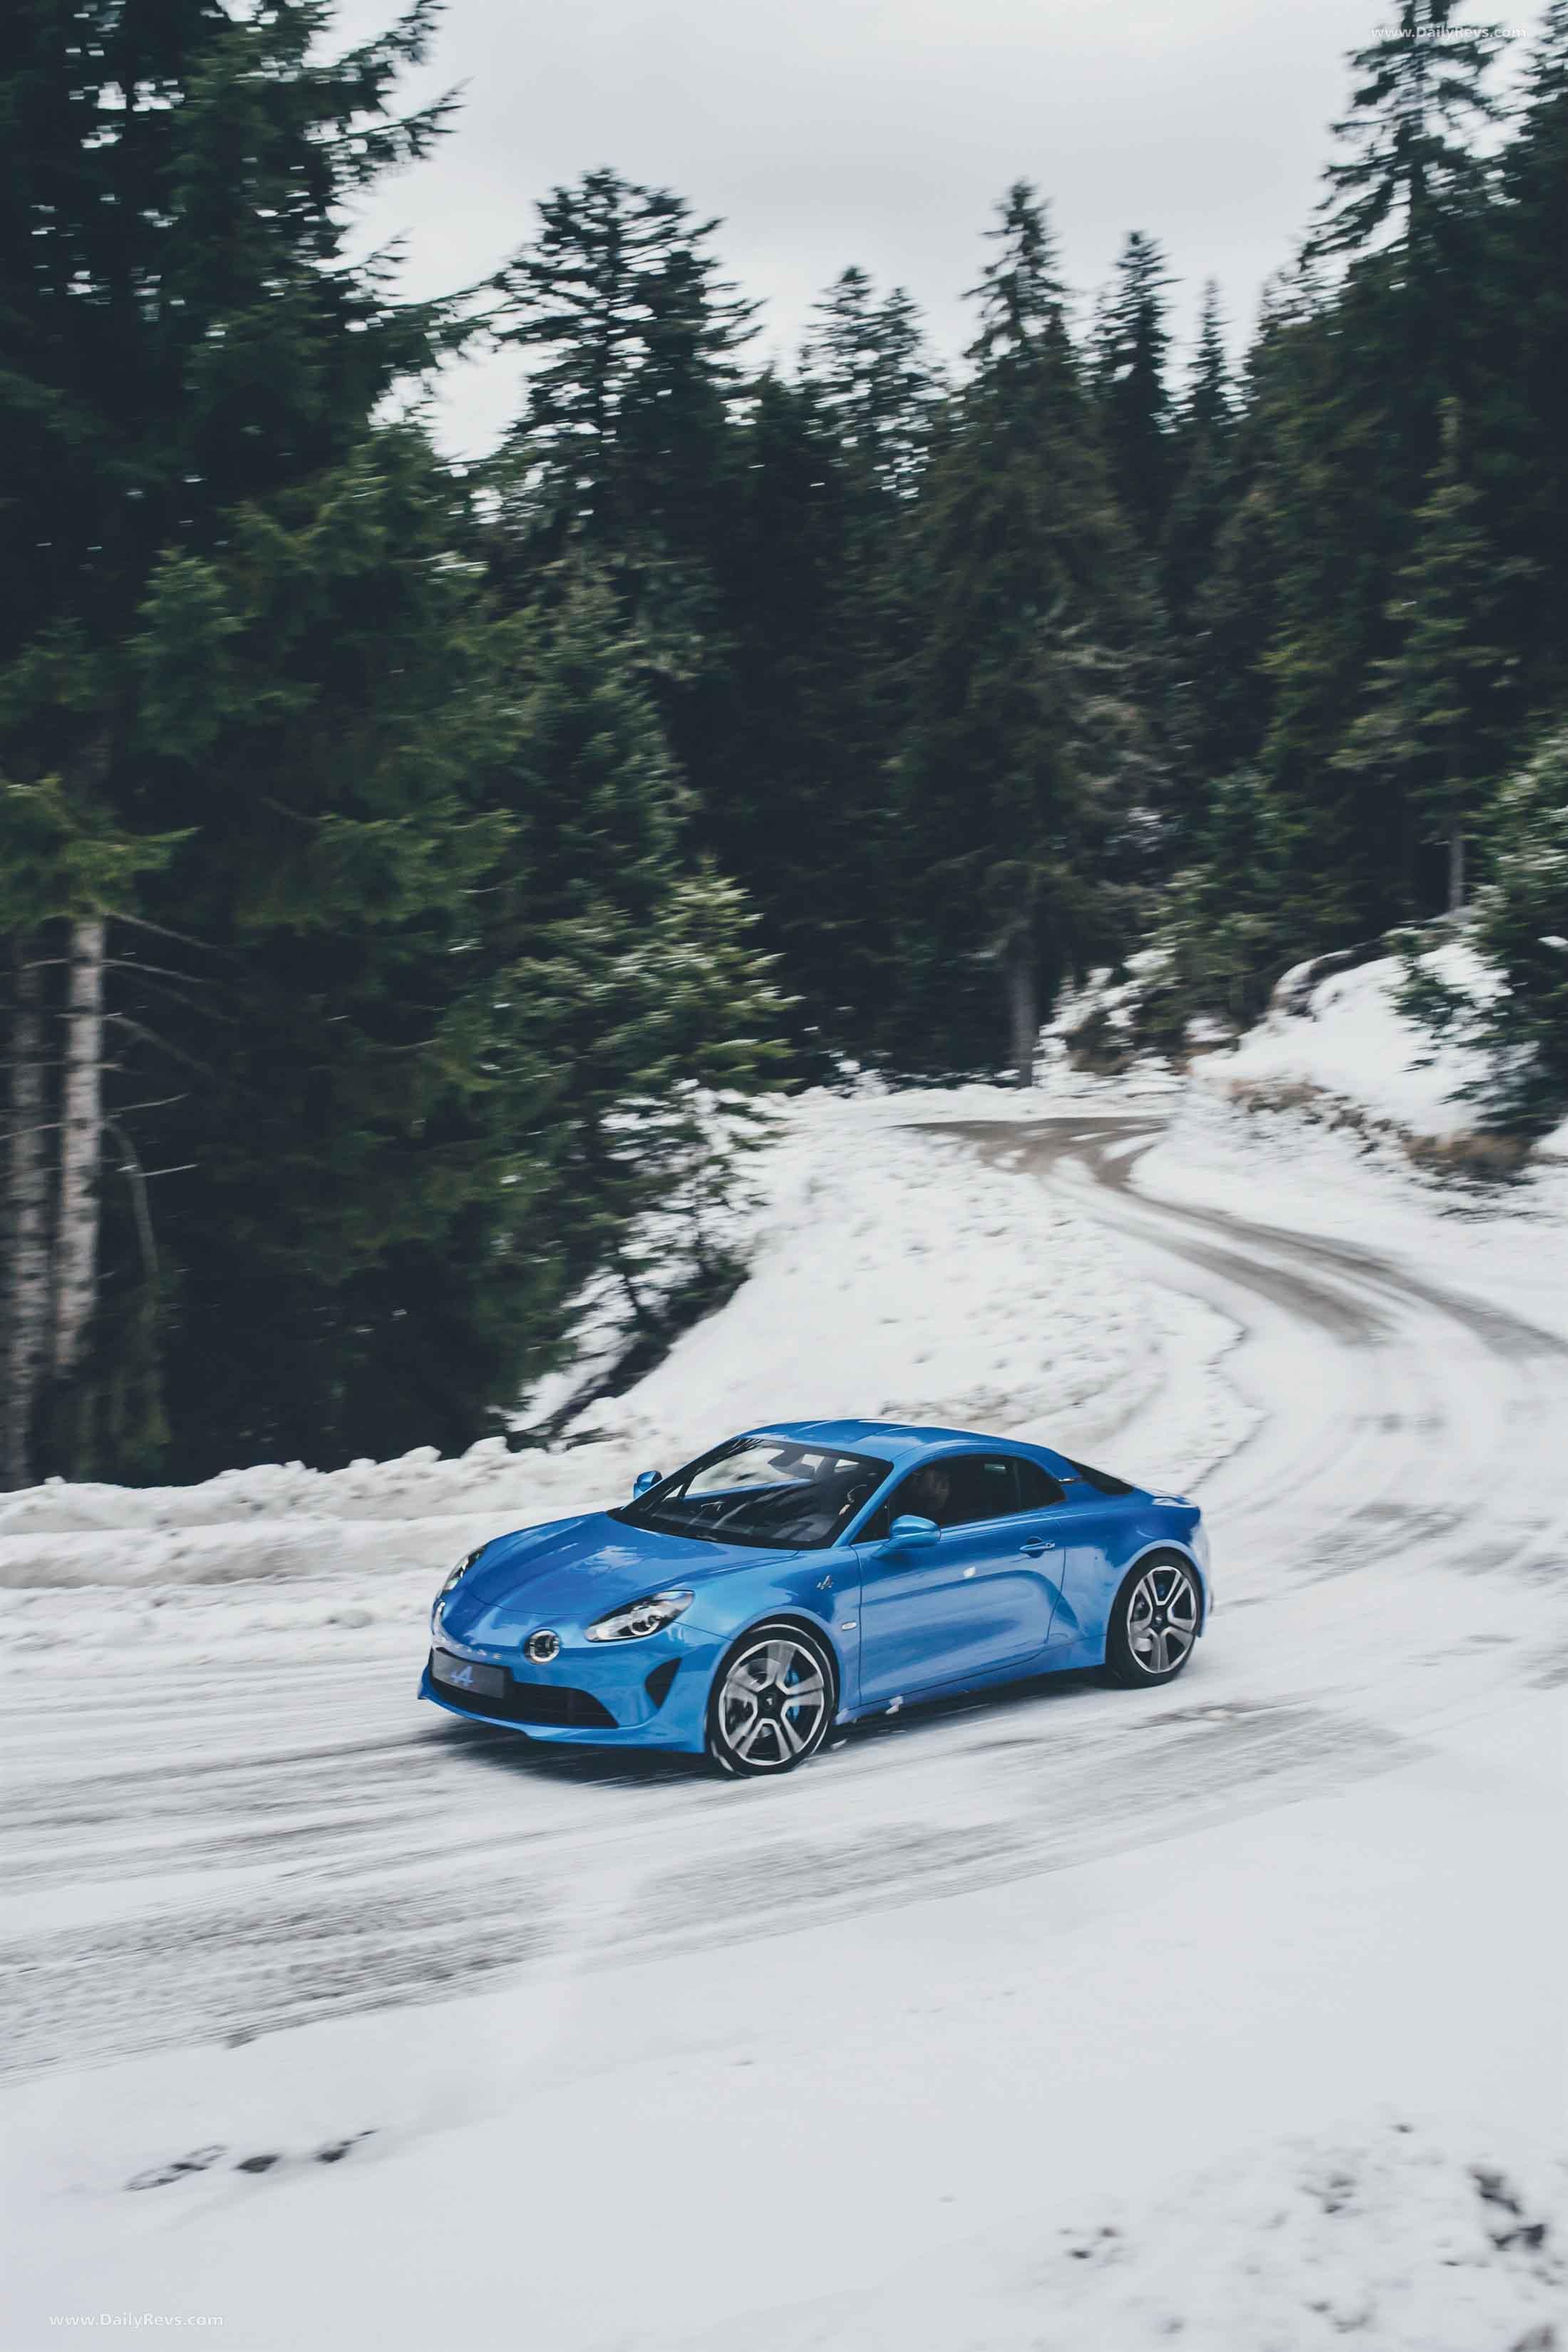 2018 Alpine A110 full